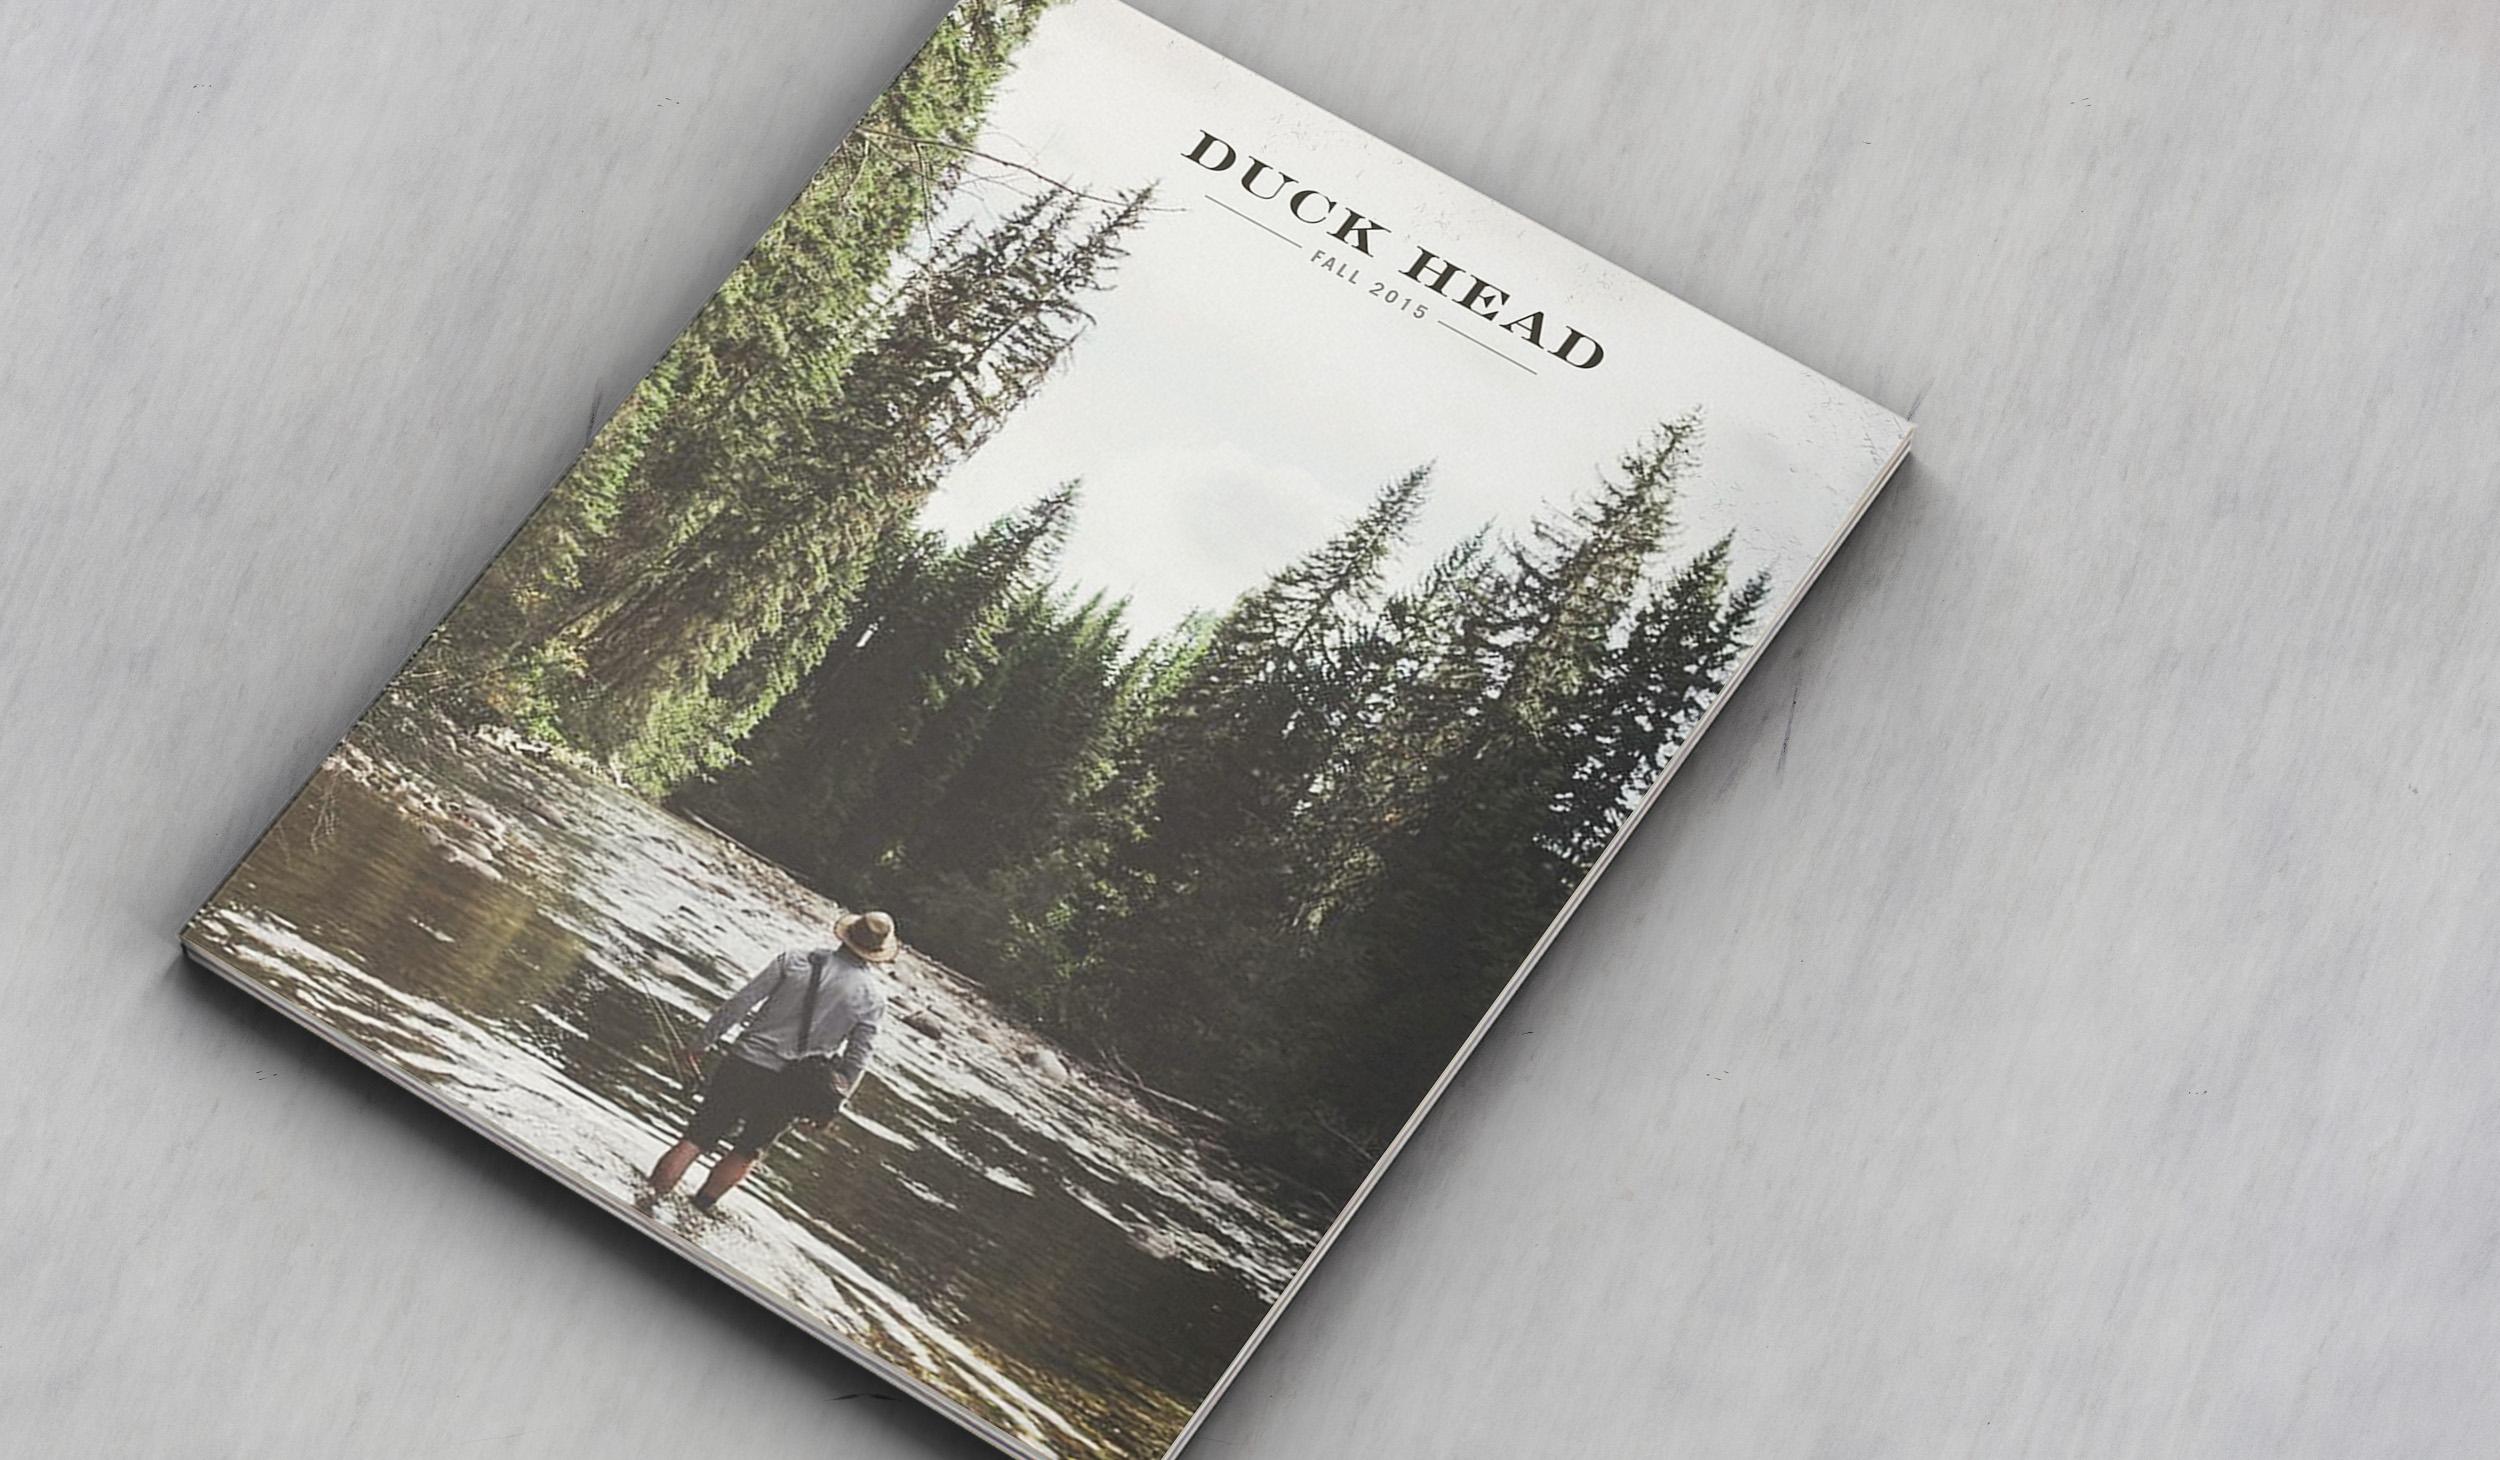 DuckHead-Cover.jpg